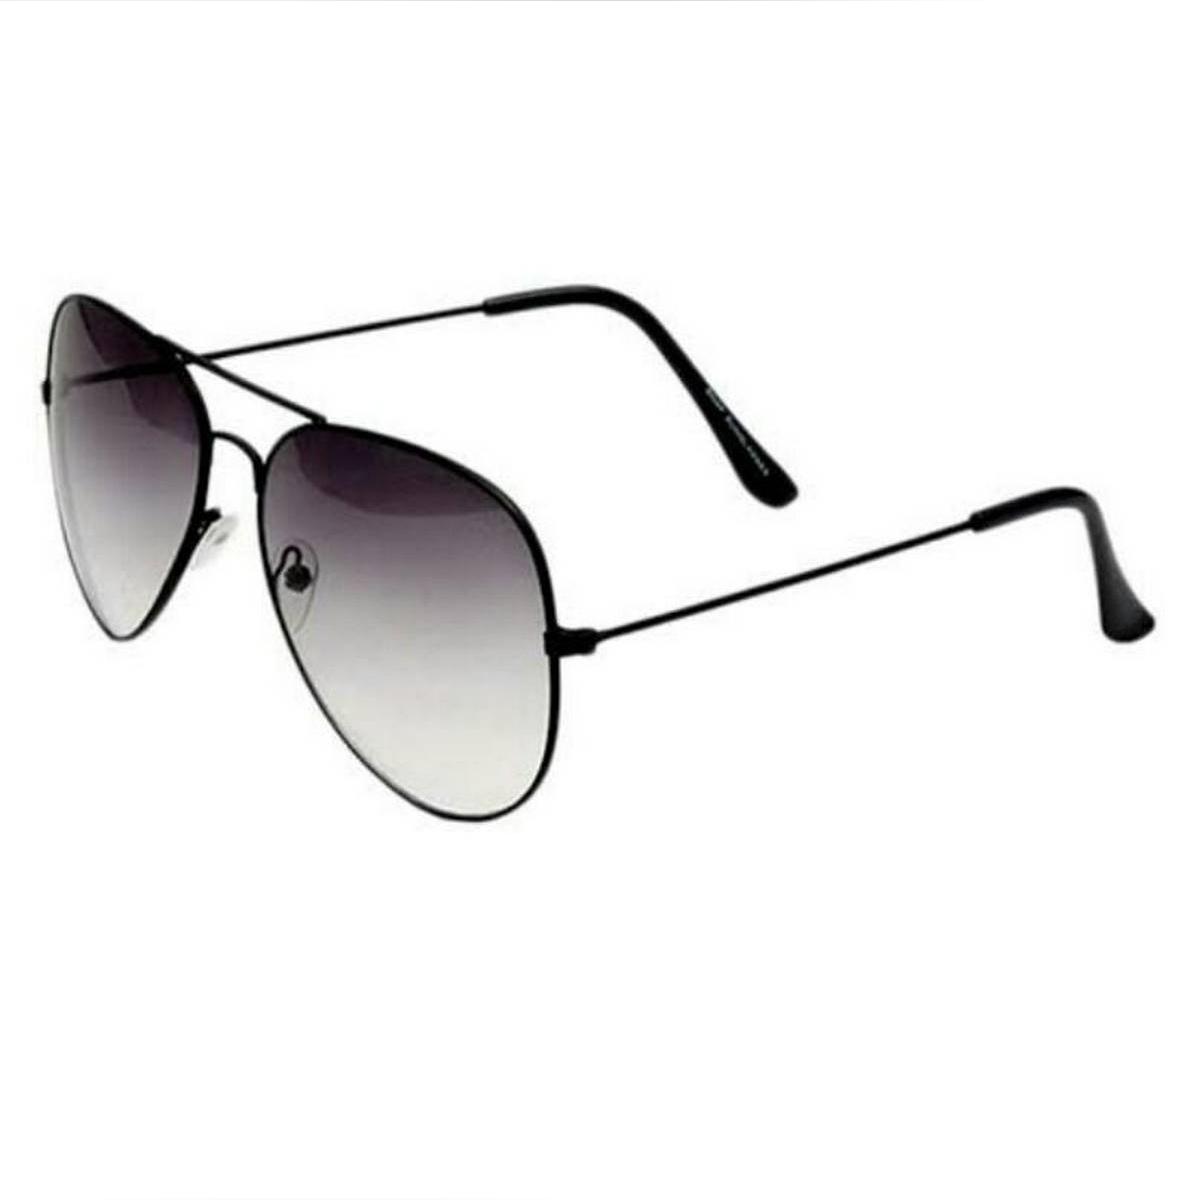 Black  Sunglasses stylish - best quality